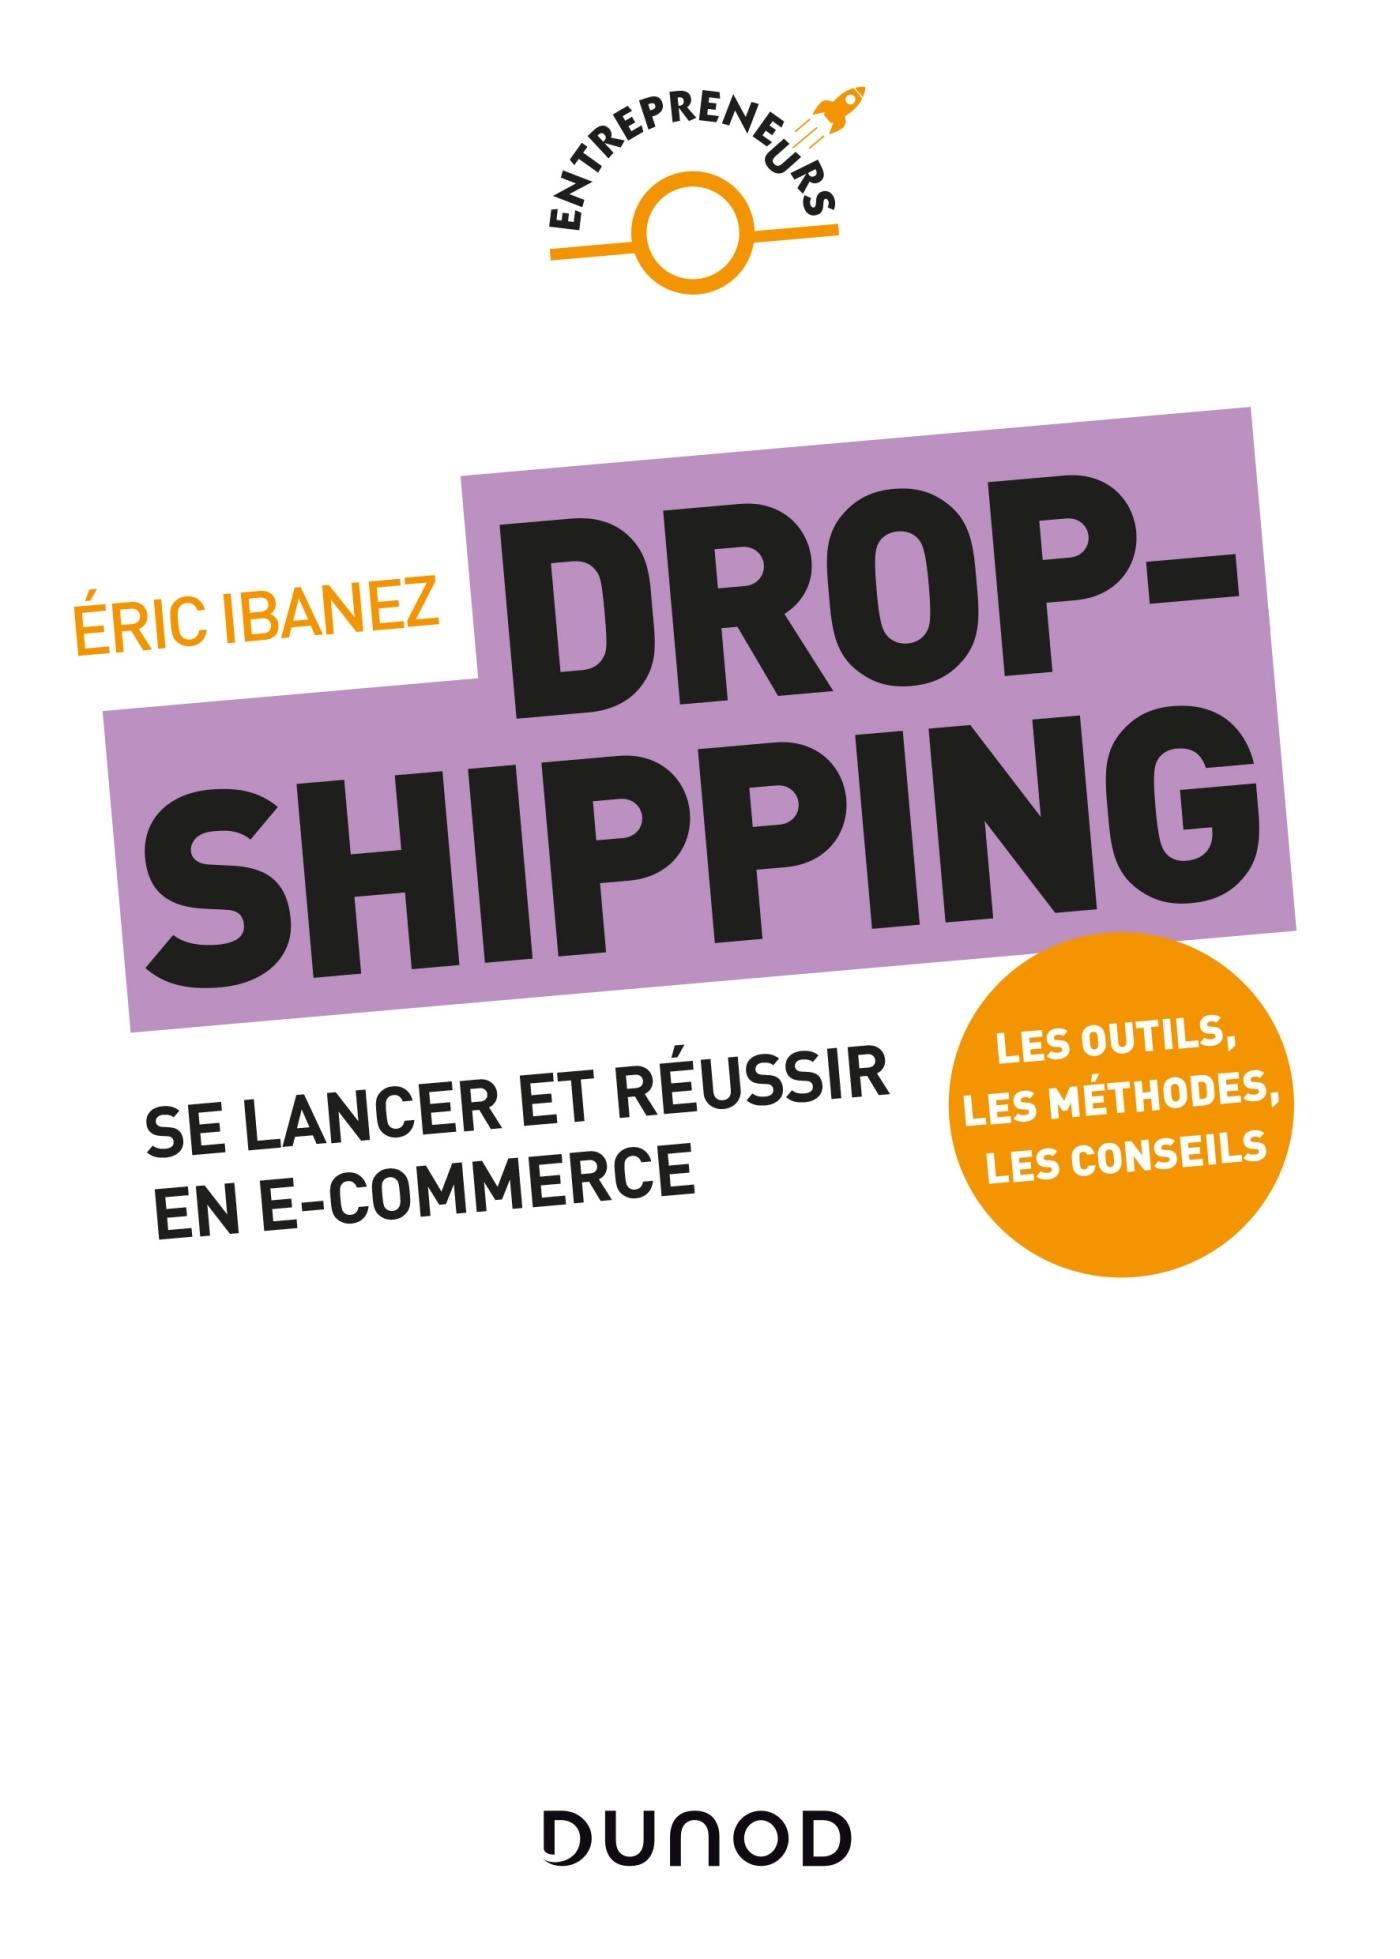 DROPSHIPPING - SE LANCER ET REUSSIR EN E-COMMERCE